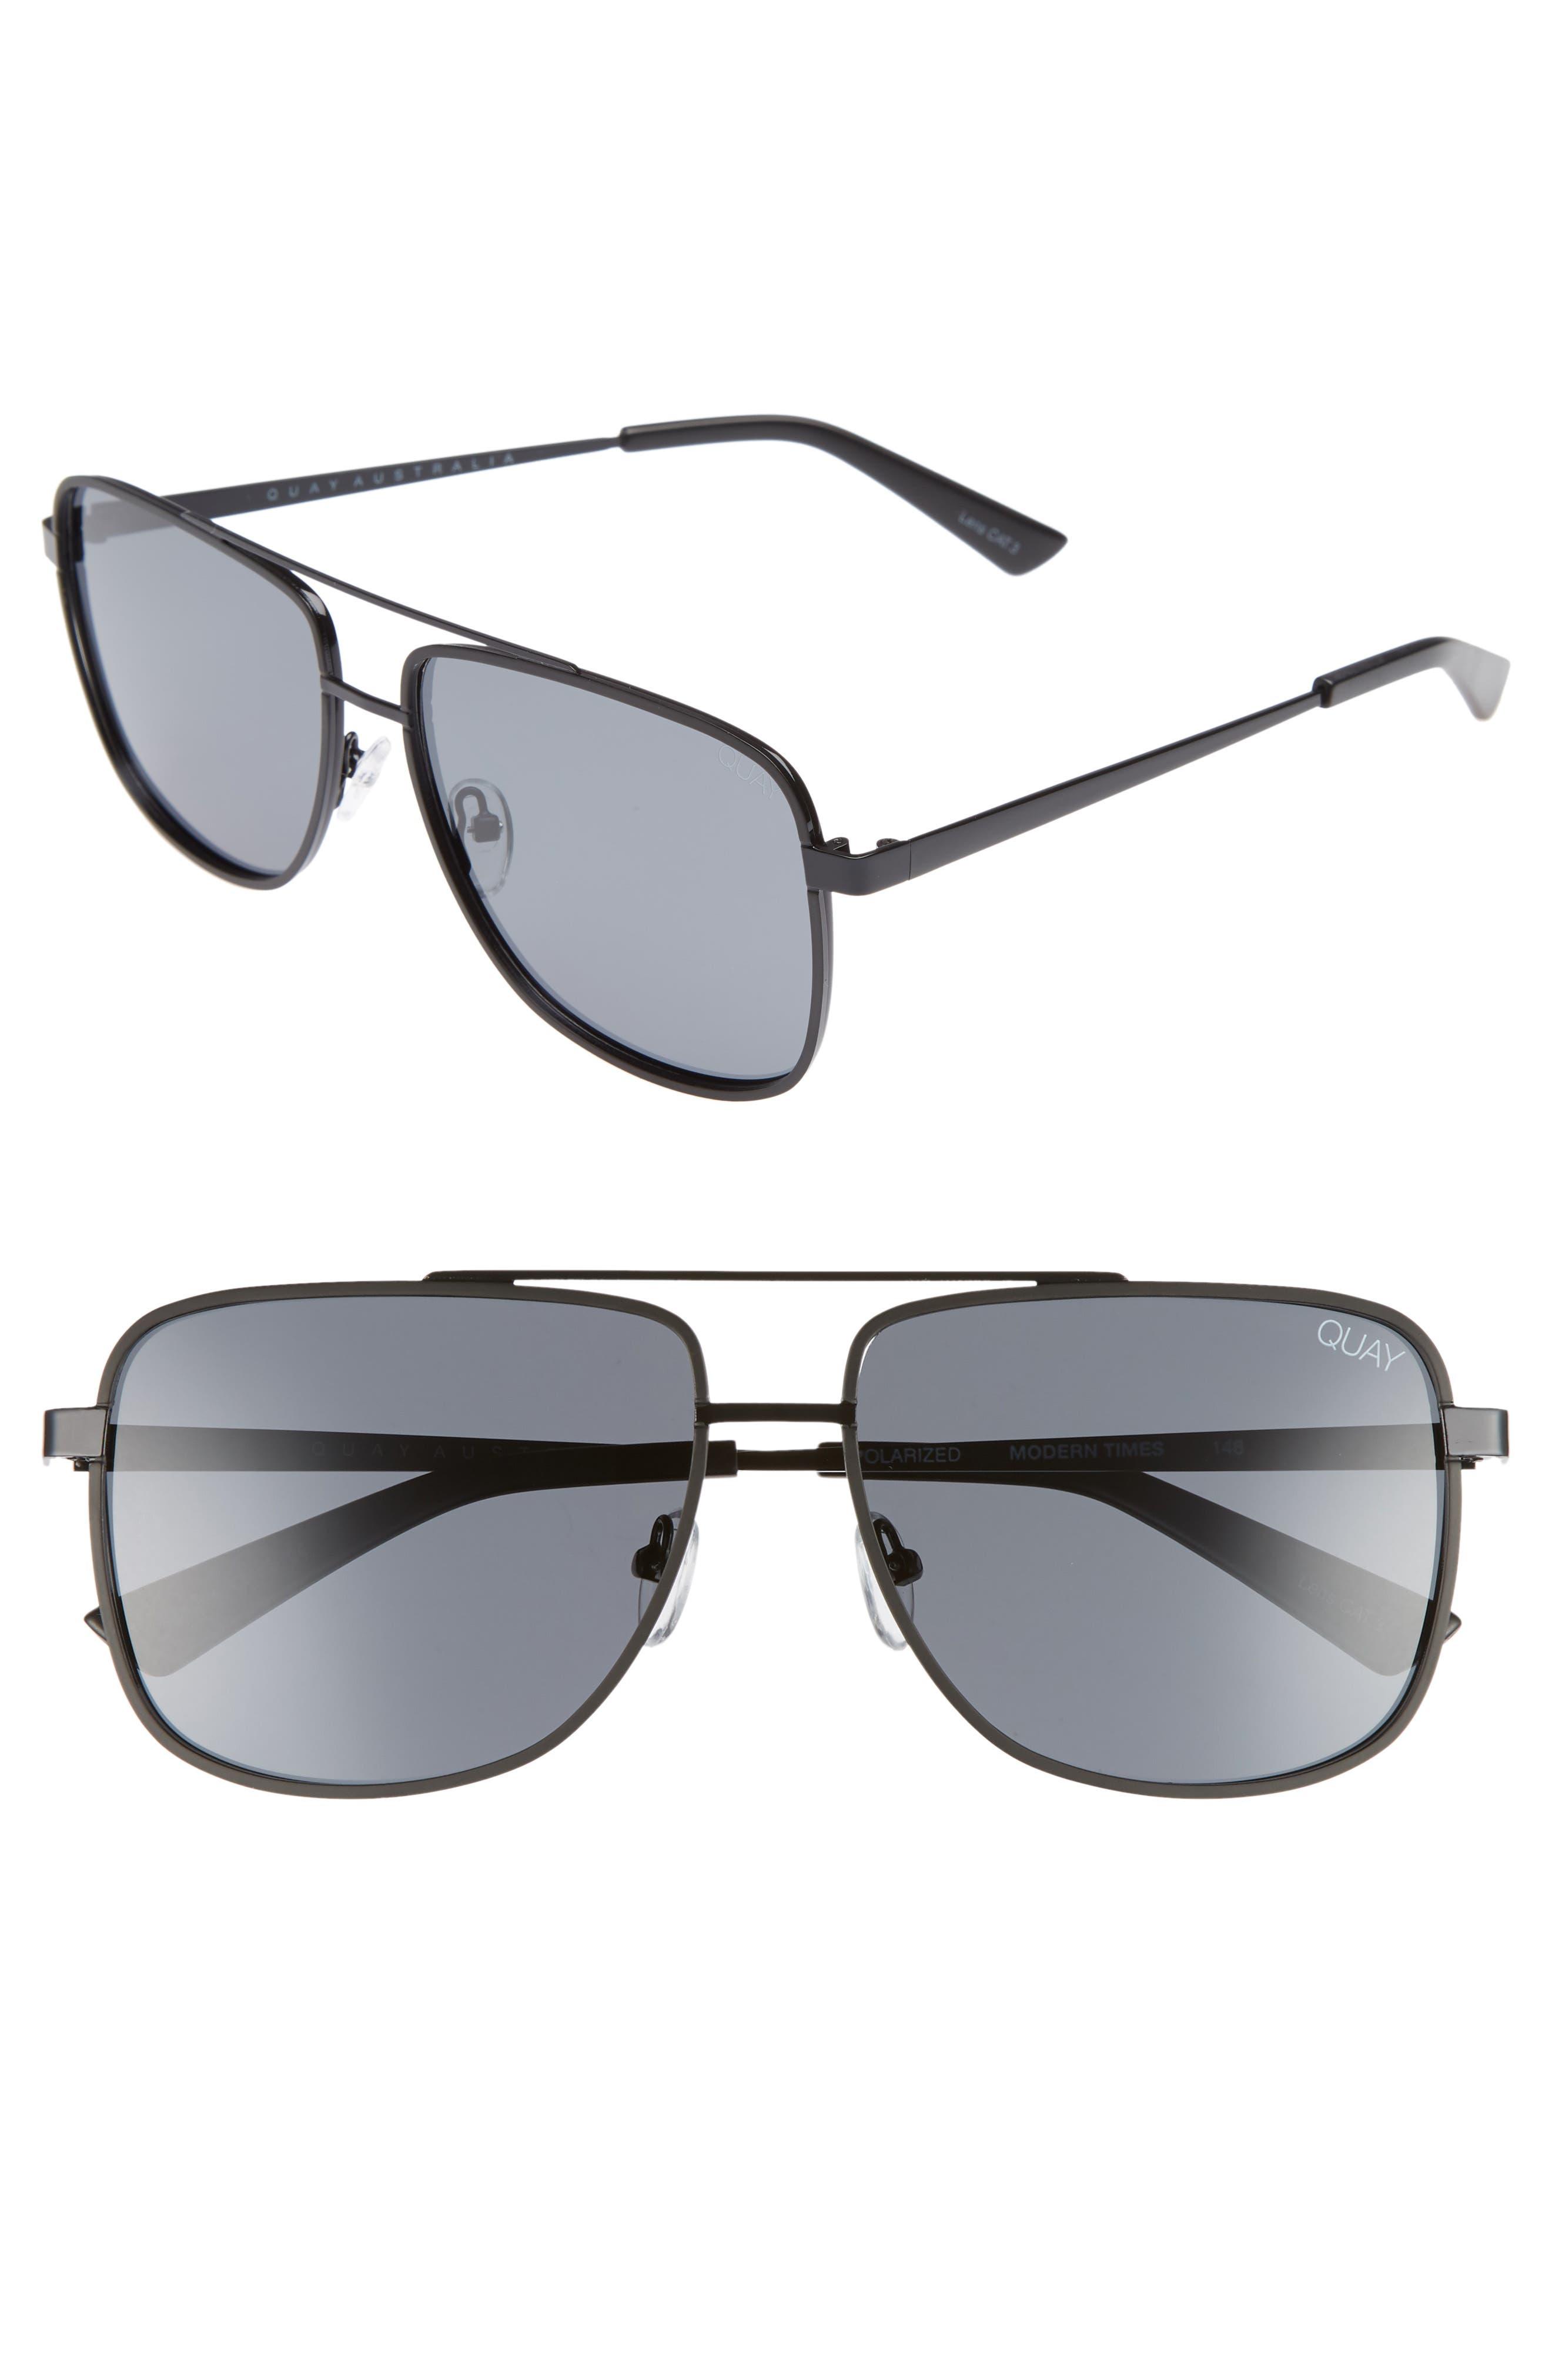 Quay Australia Modern Times 57Mm Polarized Aviator Sunglasses - Black / Smoke Lens